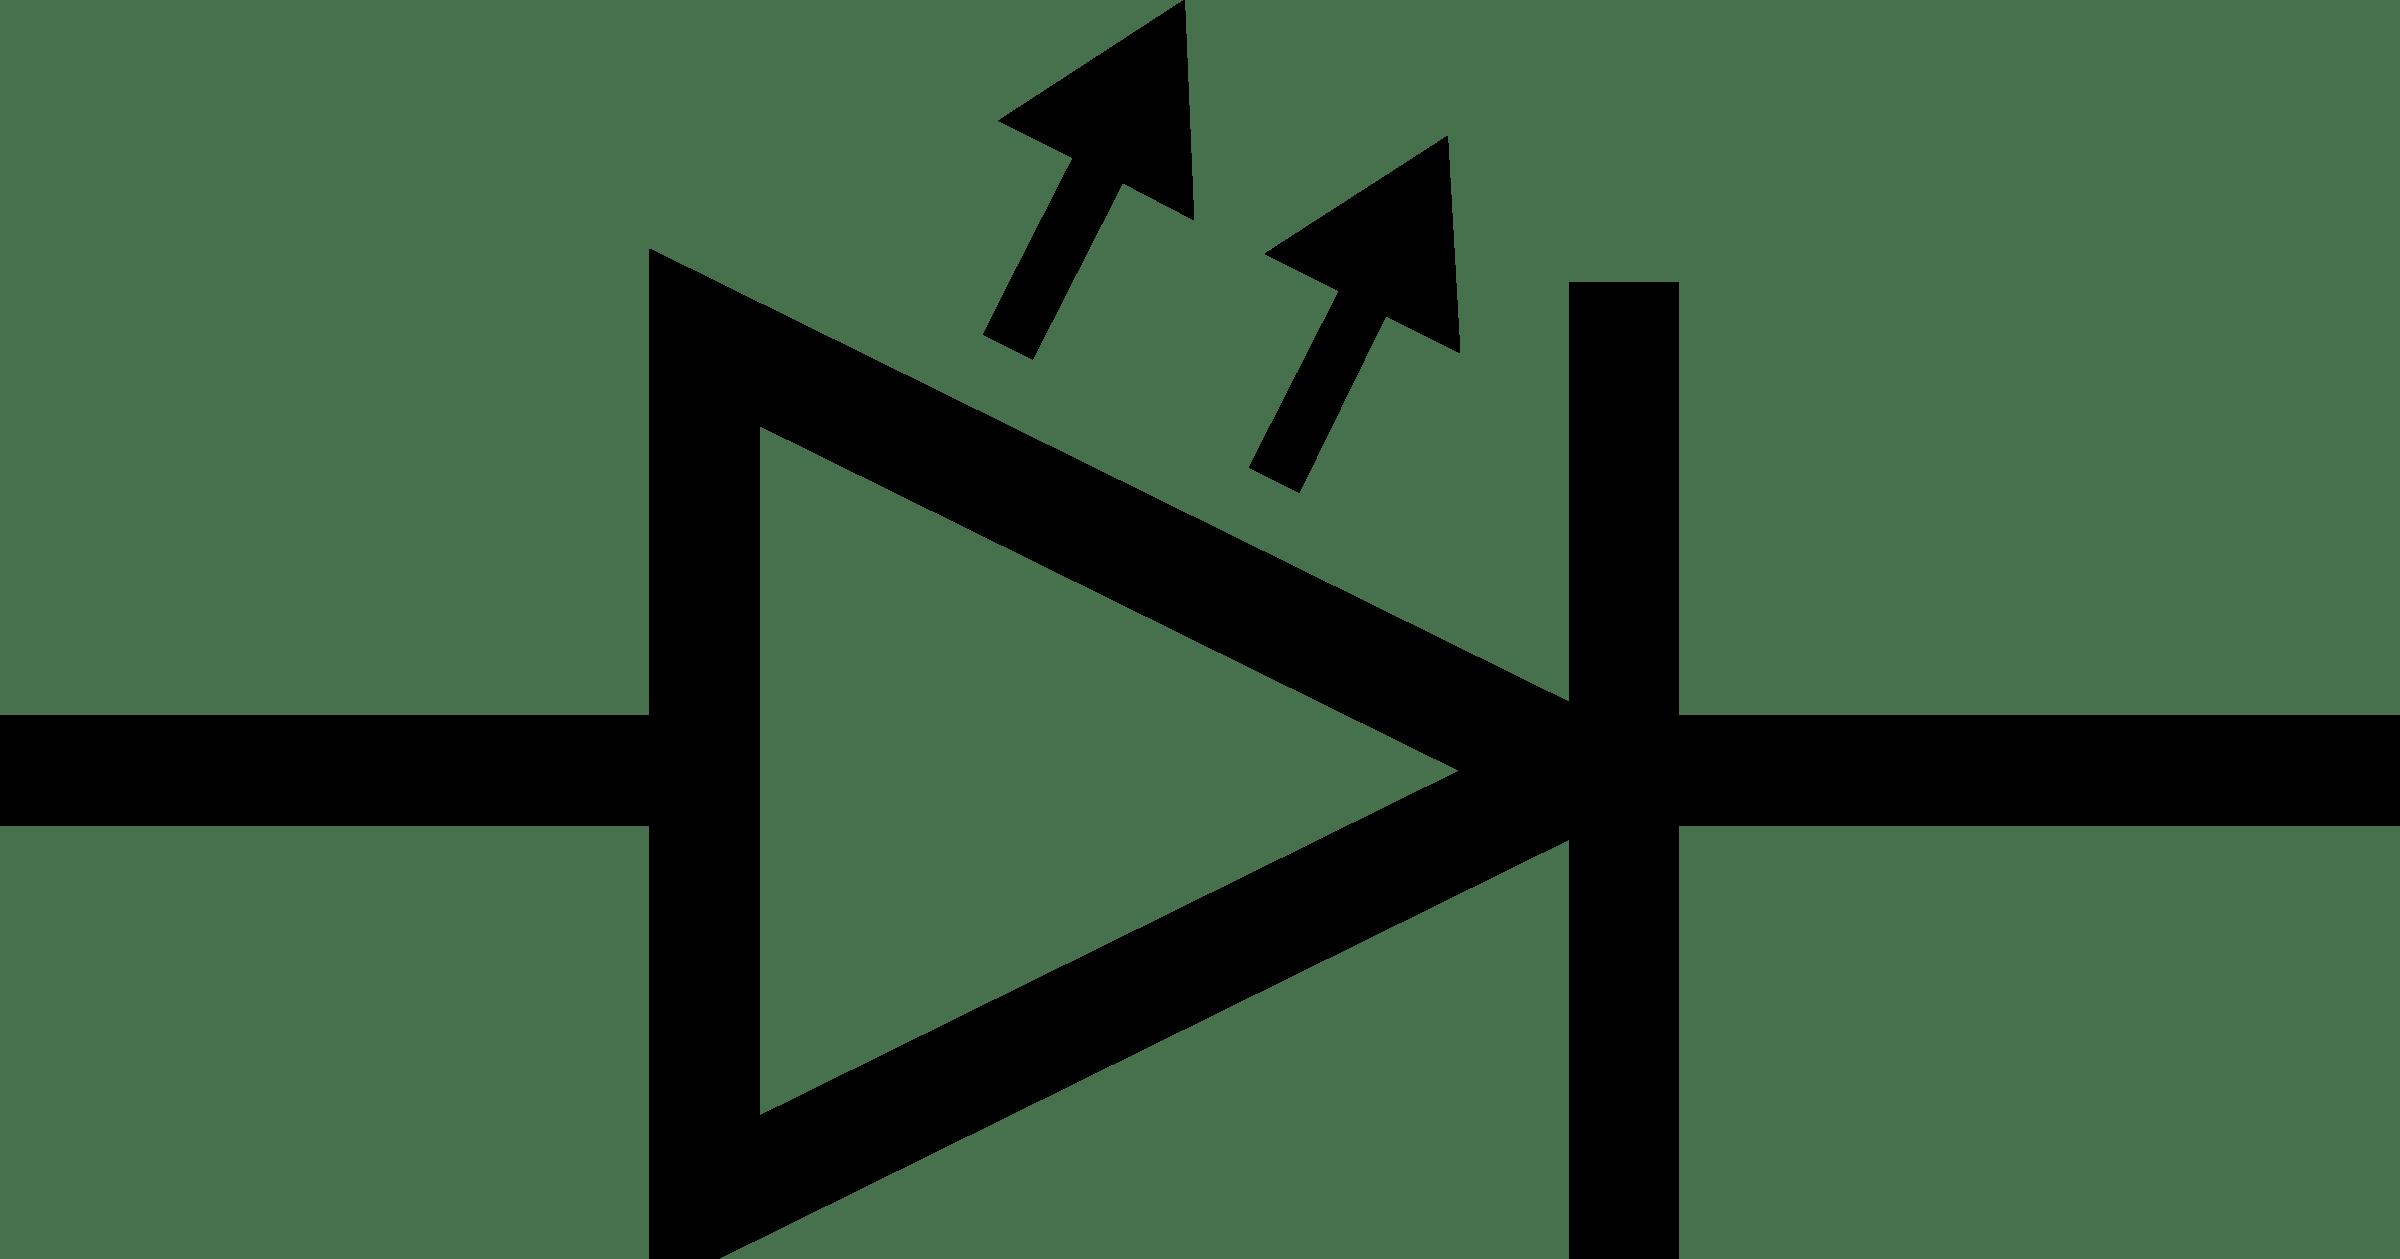 Symbols Of Diode